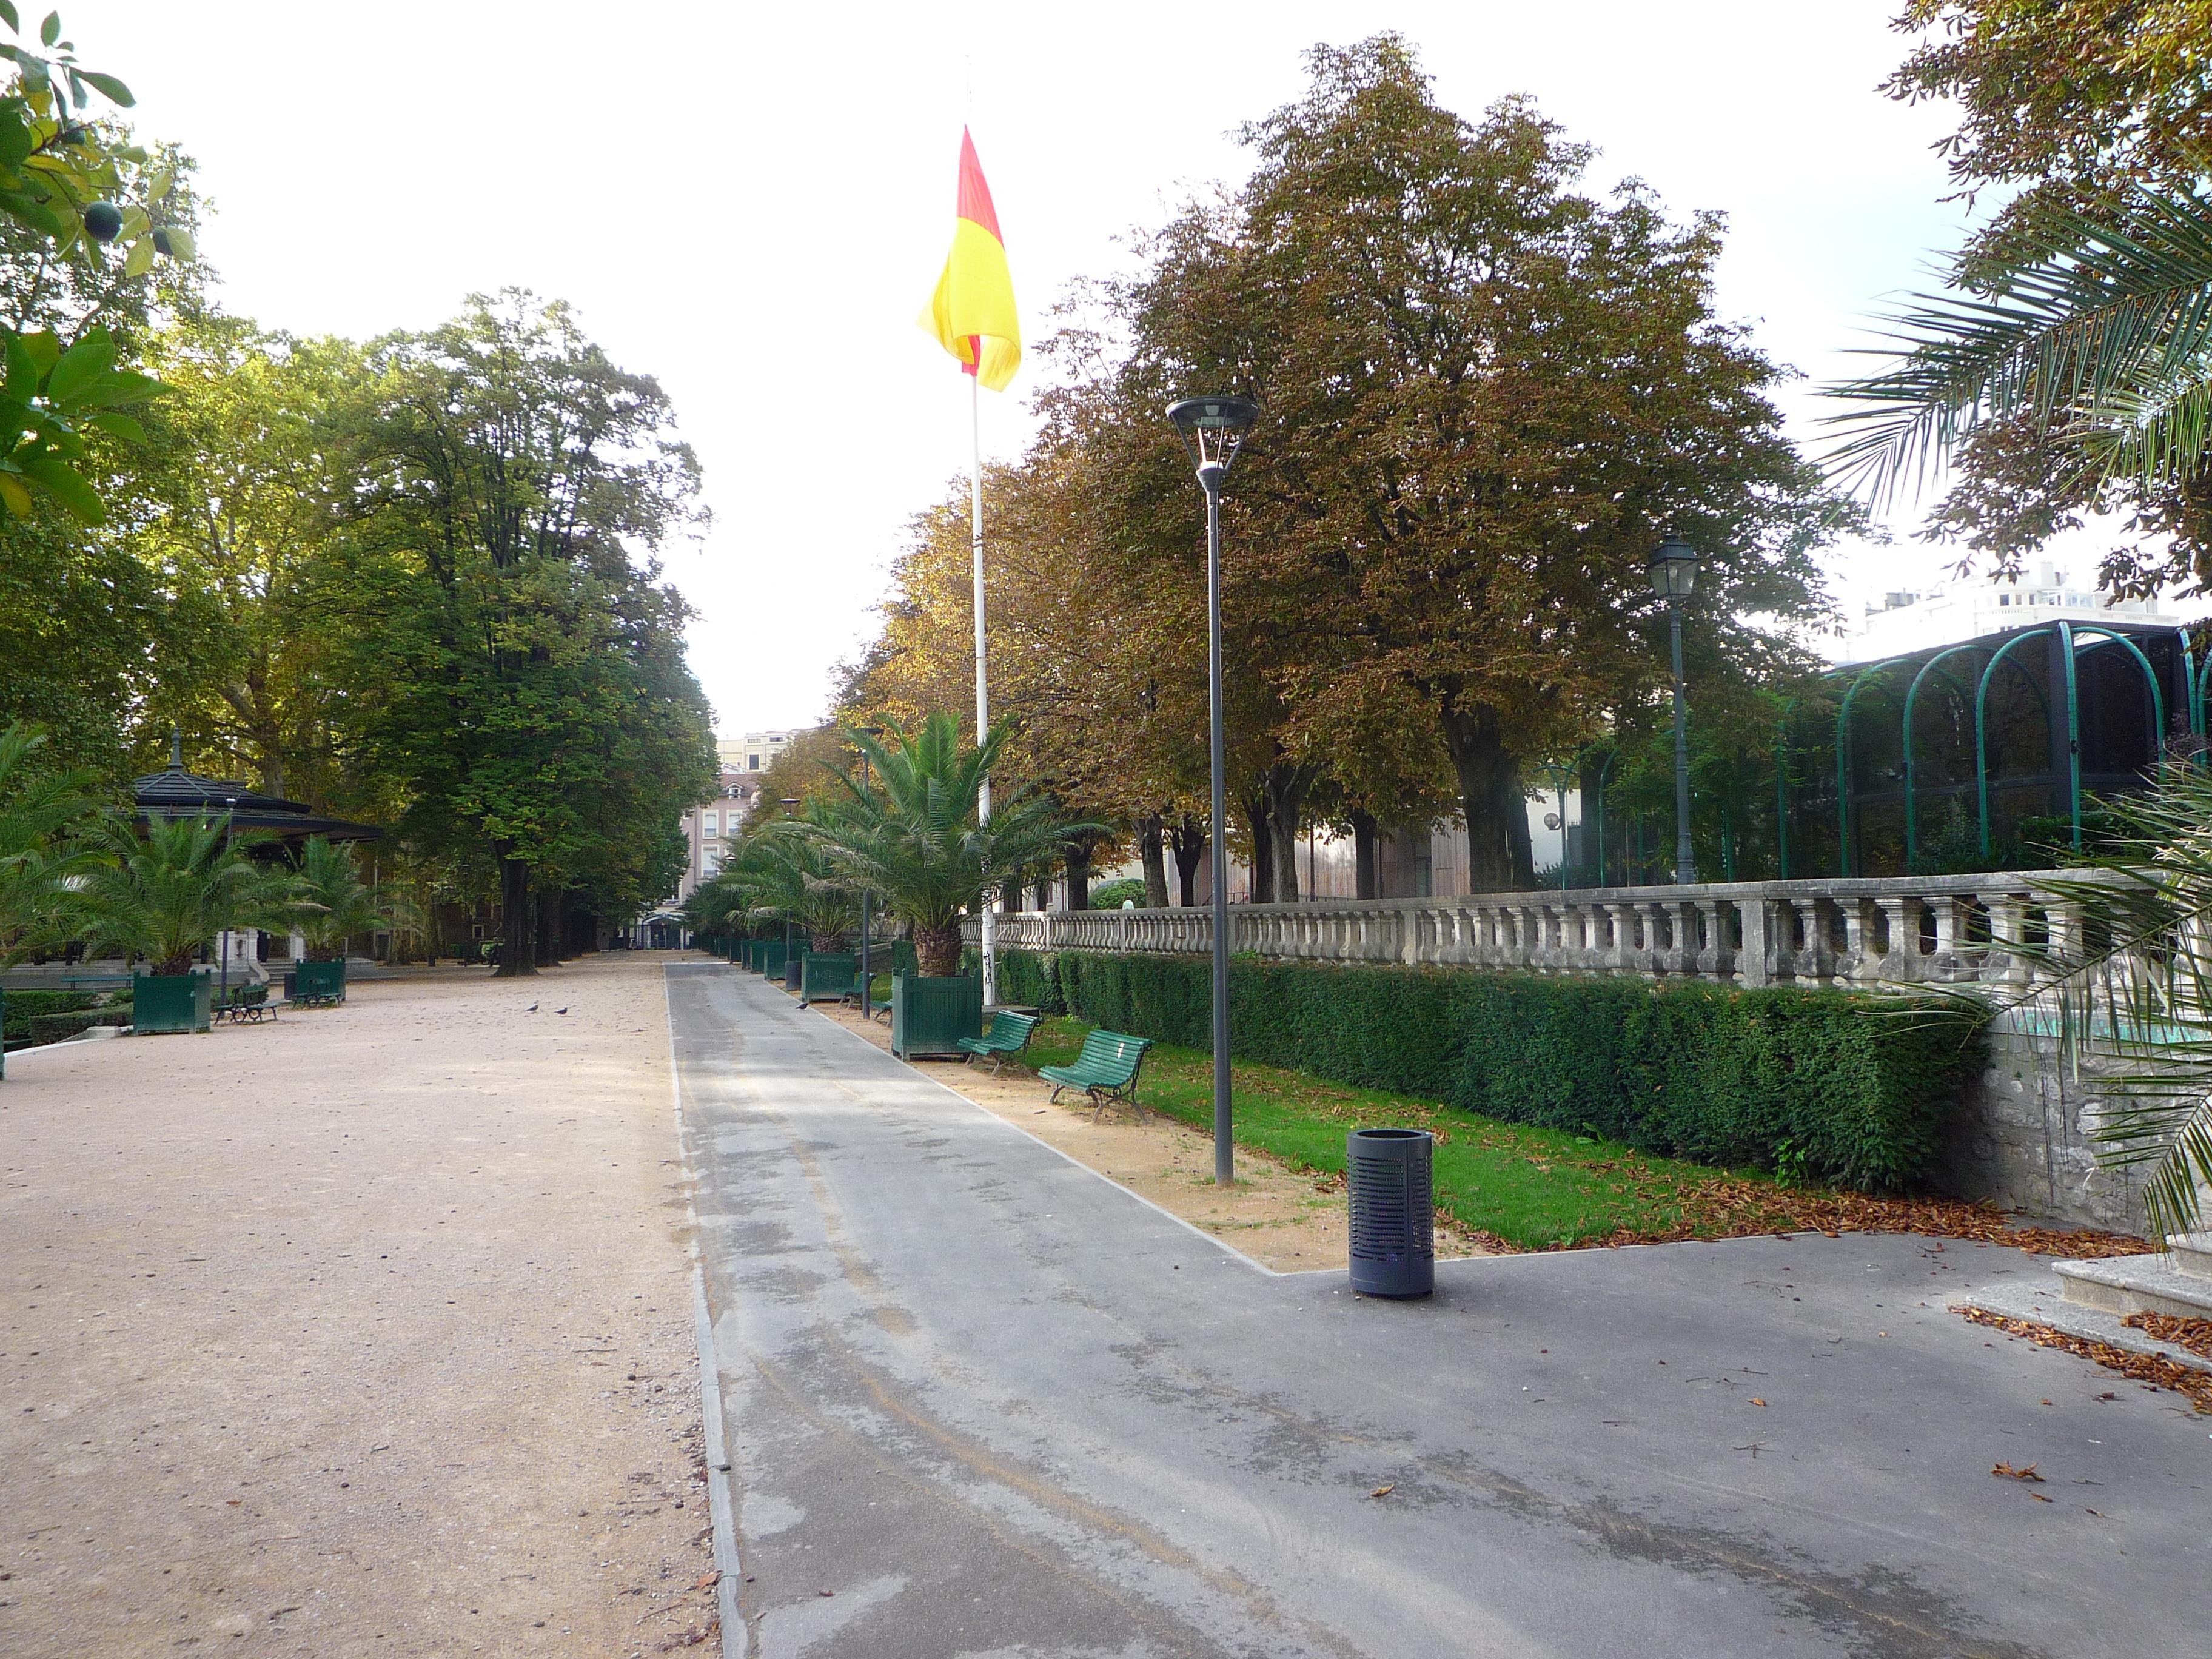 Jardin de ville rouen design - Terrasse jardin ville tours ...